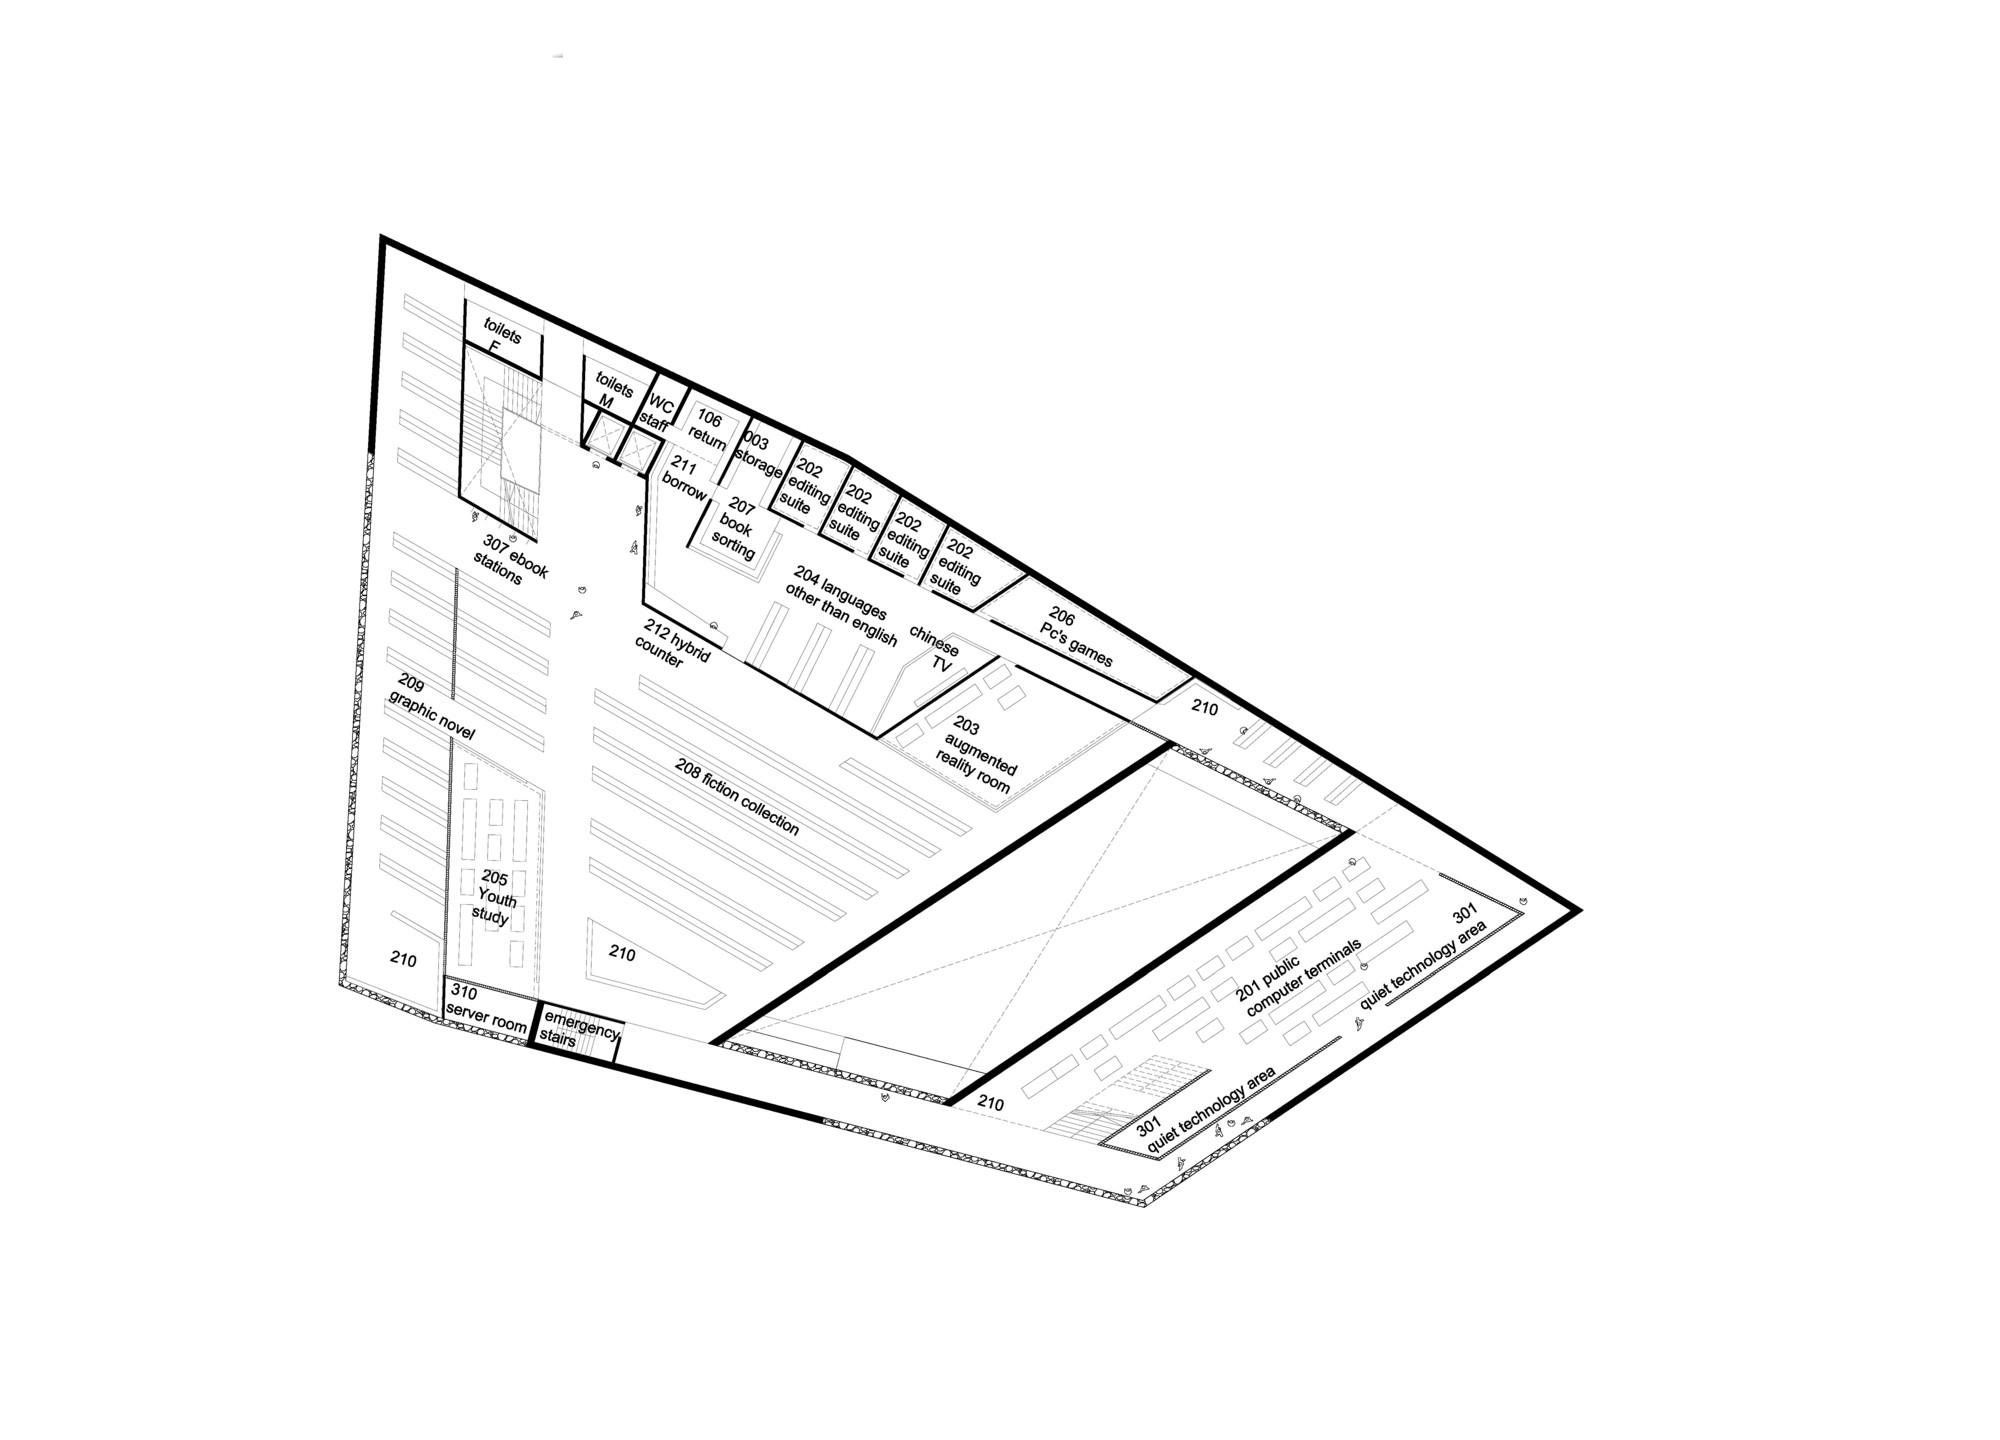 Green Square Library & Plaza Proposal / Gus Wüstemann